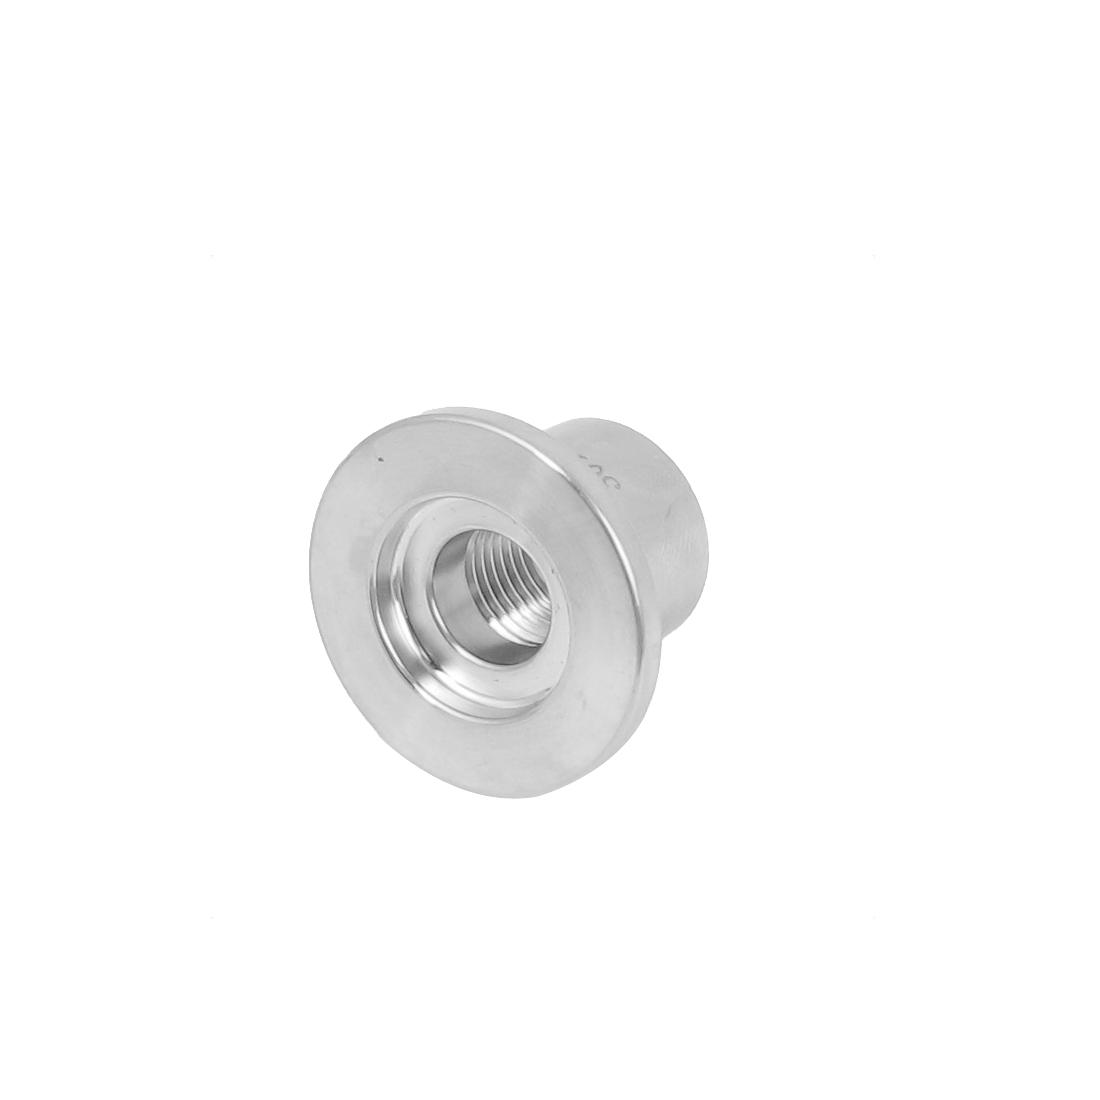 304 Stainless Steel Vacuum KF16 Flange 1/4BSP Female Thread Adapter